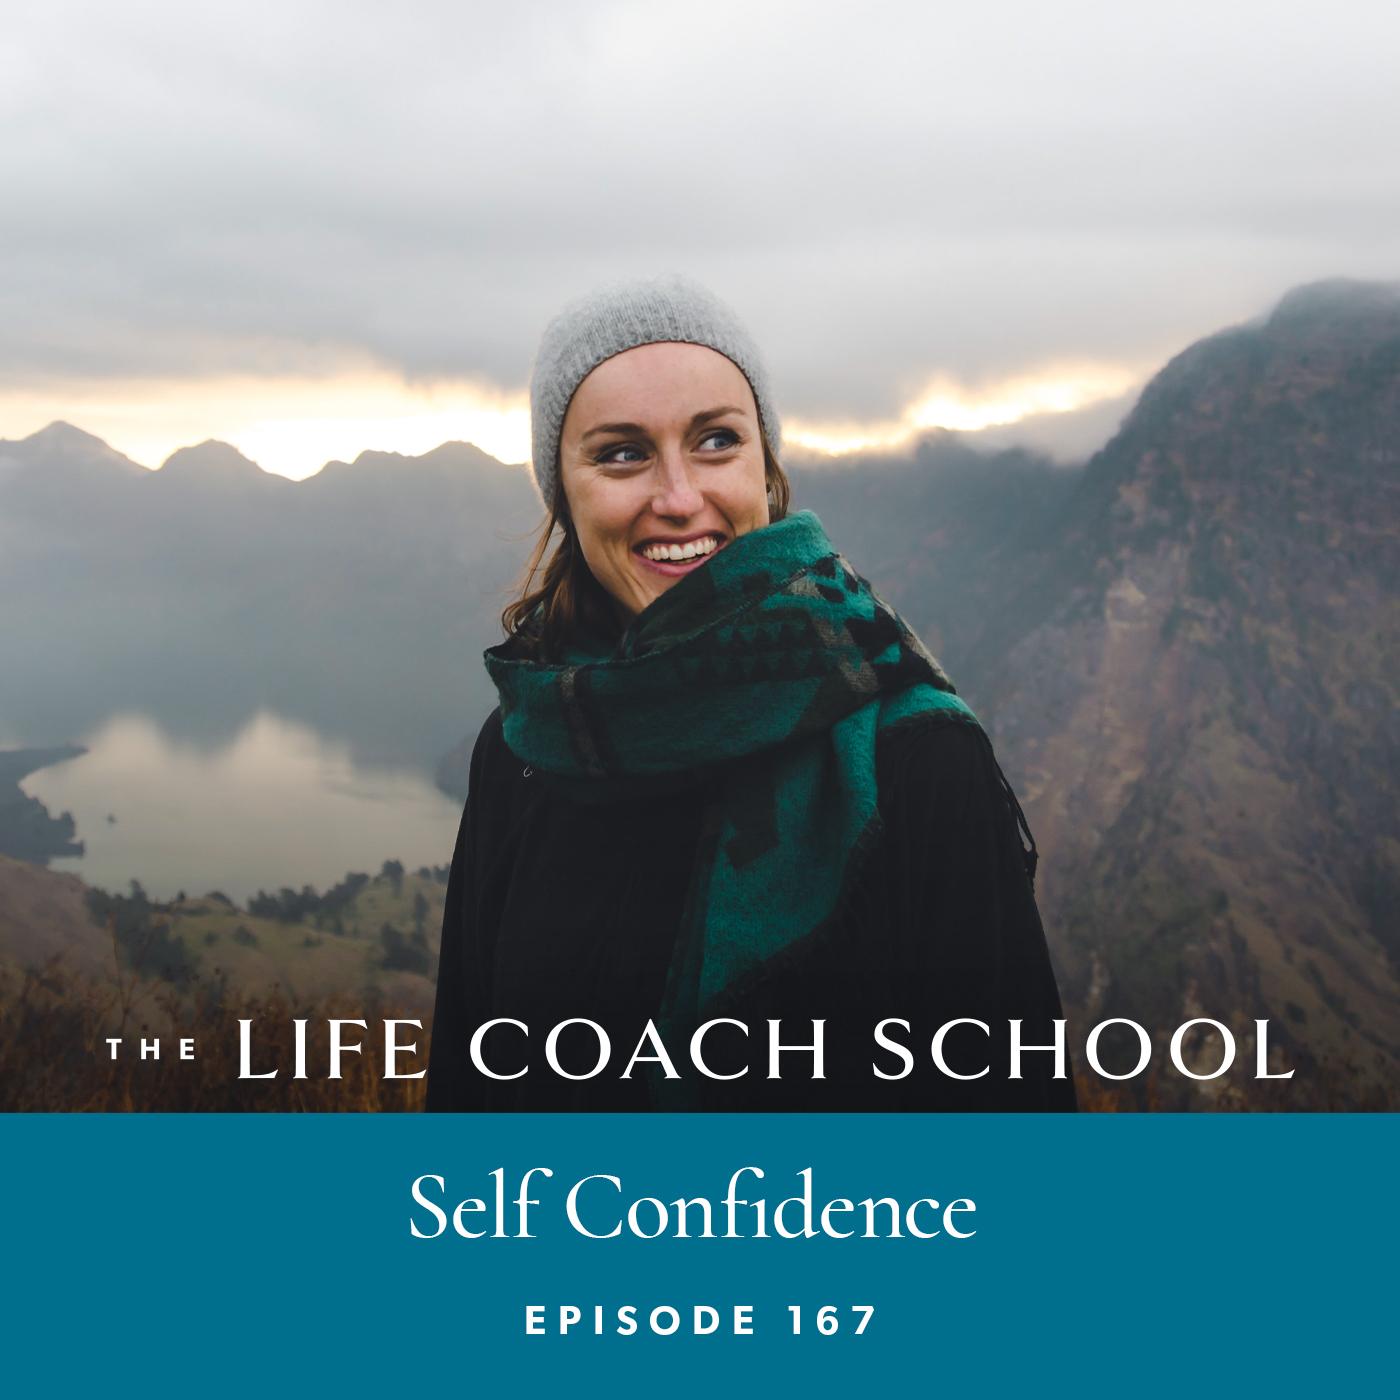 The Life Coach School Podcast with Brooke Castillo | Episode 167 | Self-Confidence